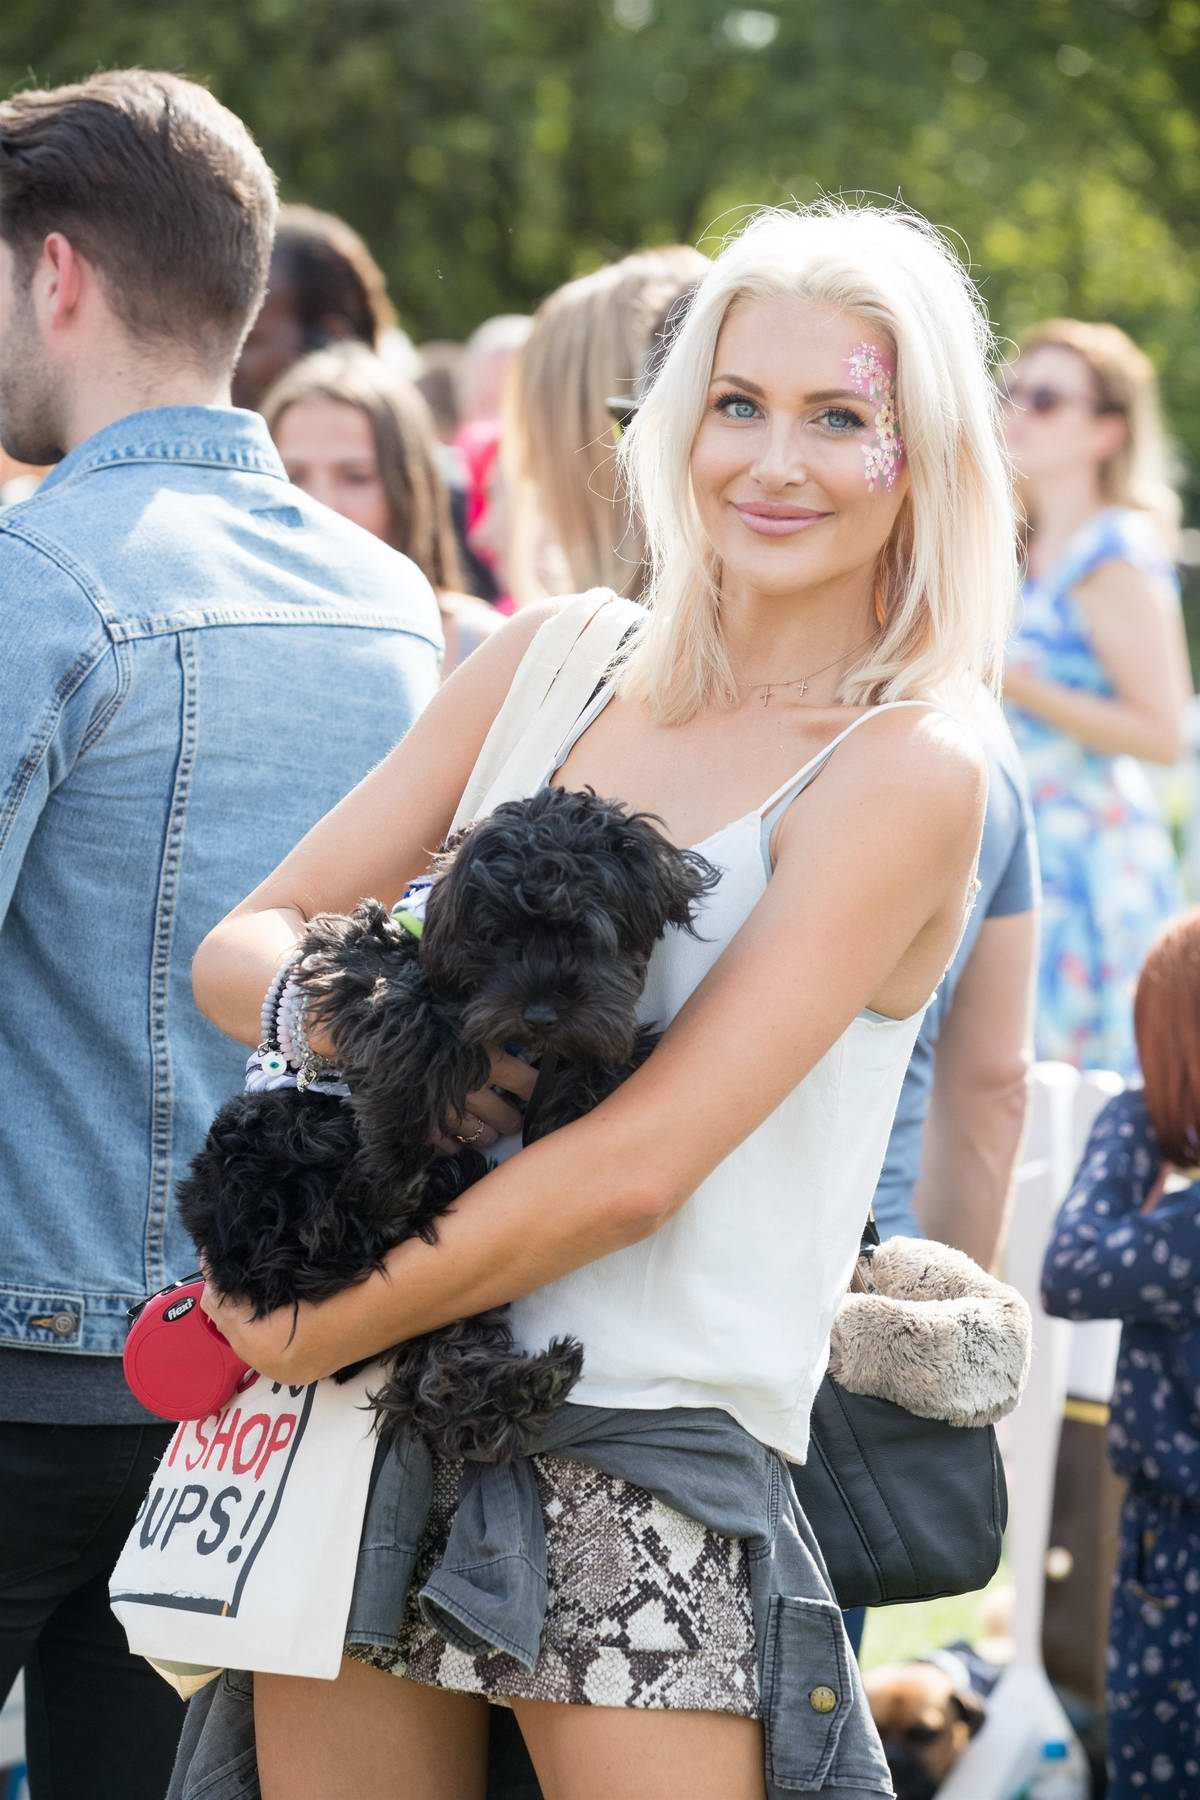 Stephanie Pratt attends the PupAid 2017 event in Primrose Hill in London